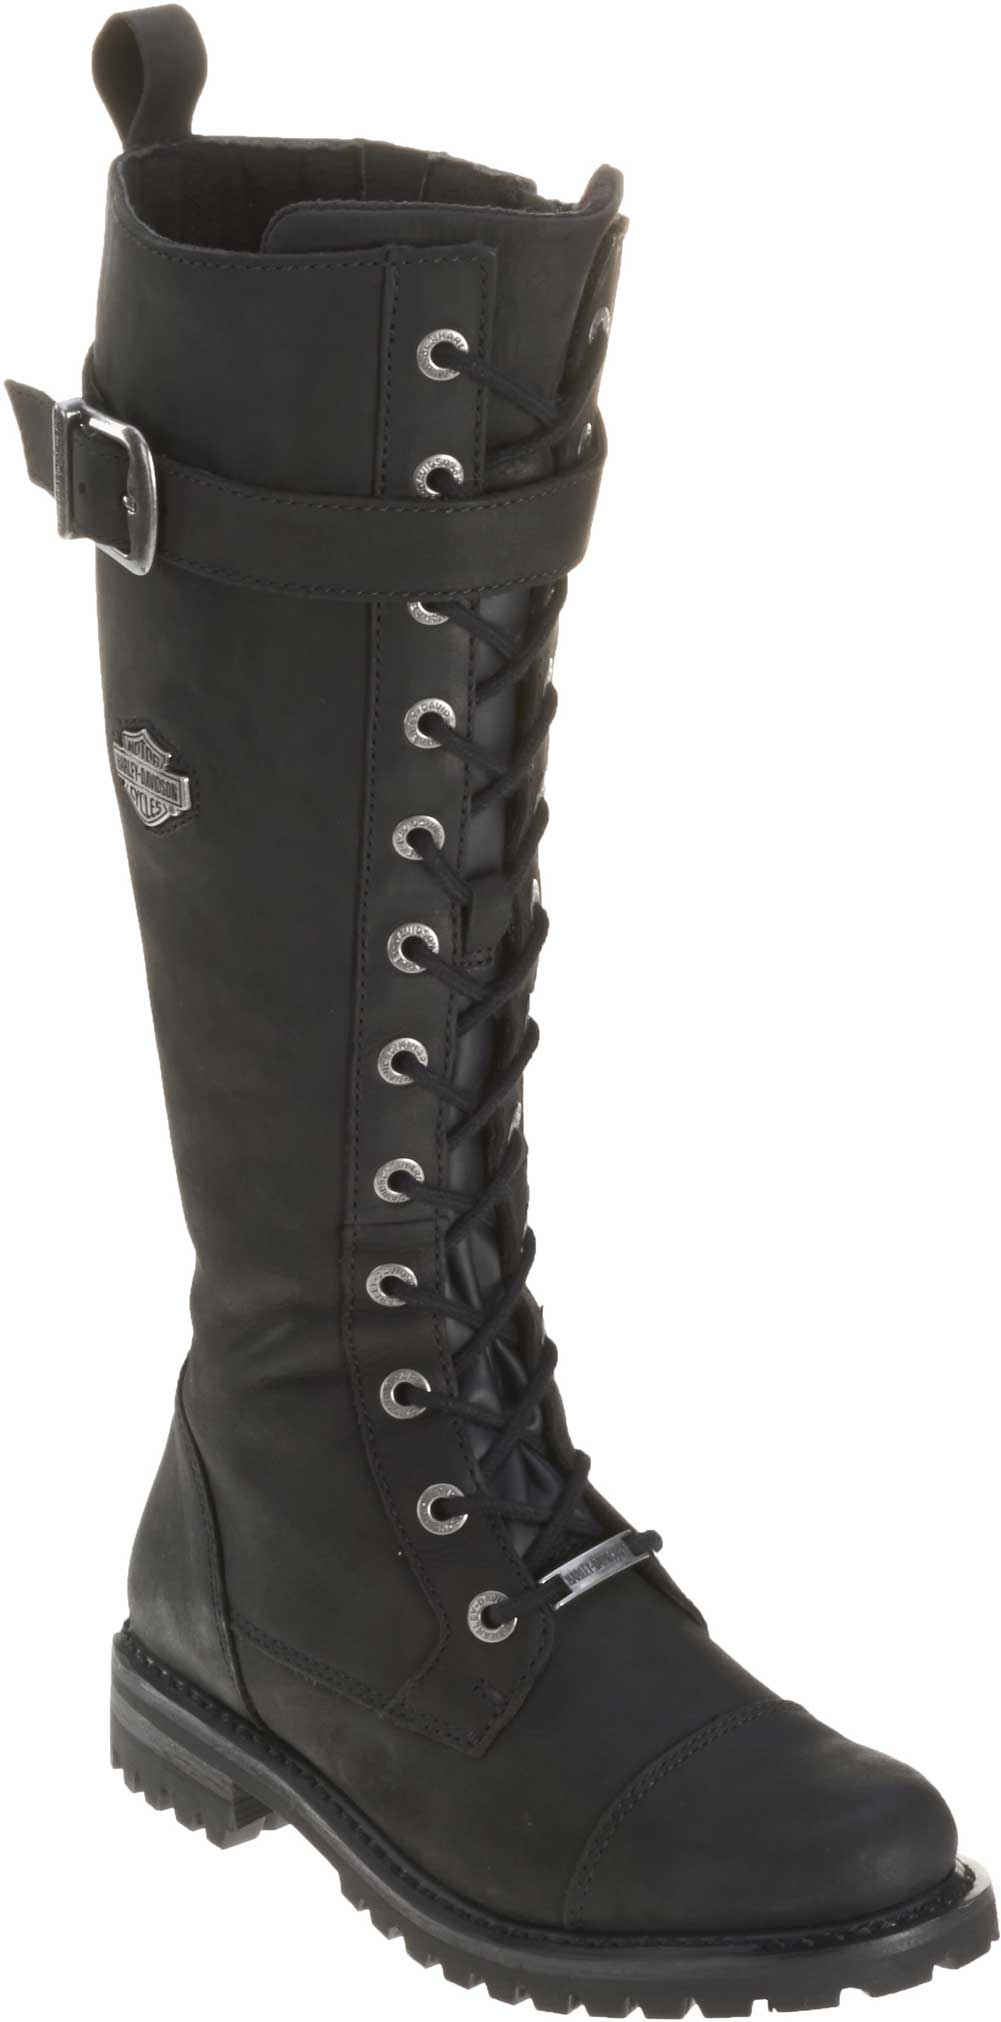 harley davidson s black leather 14 inch